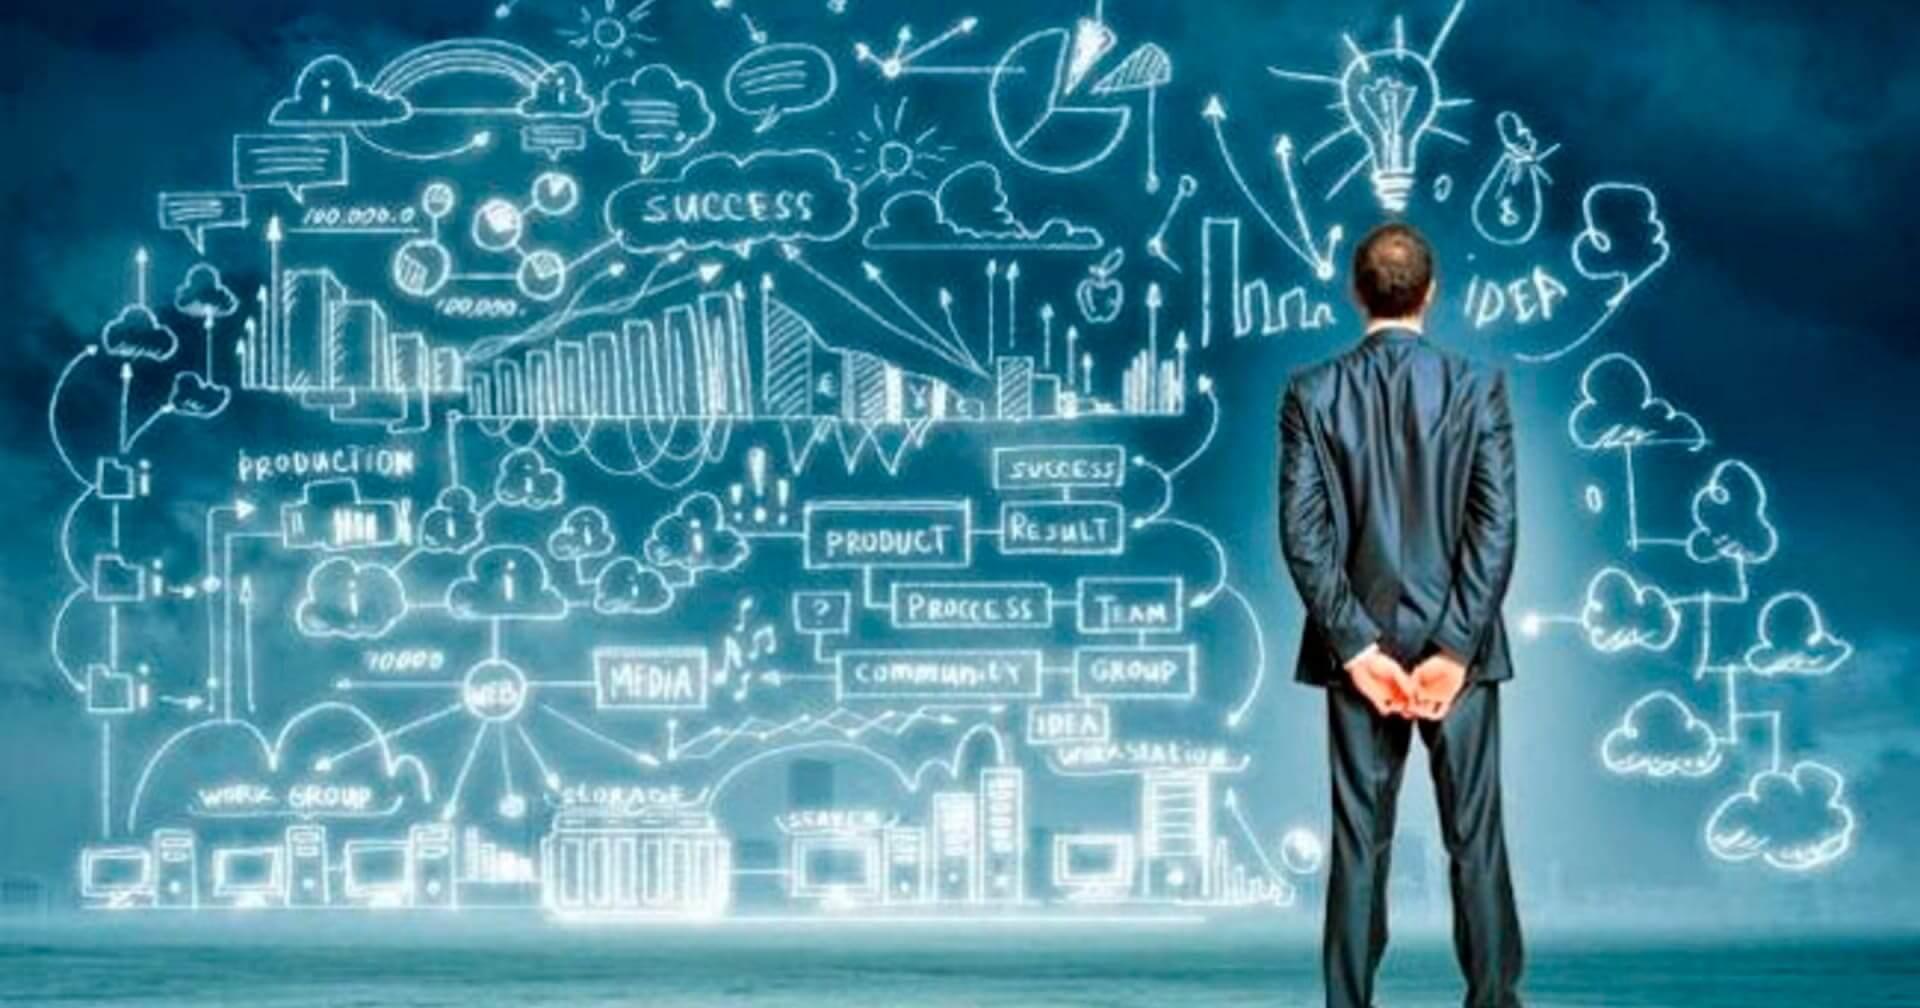 smart city goals - standardization